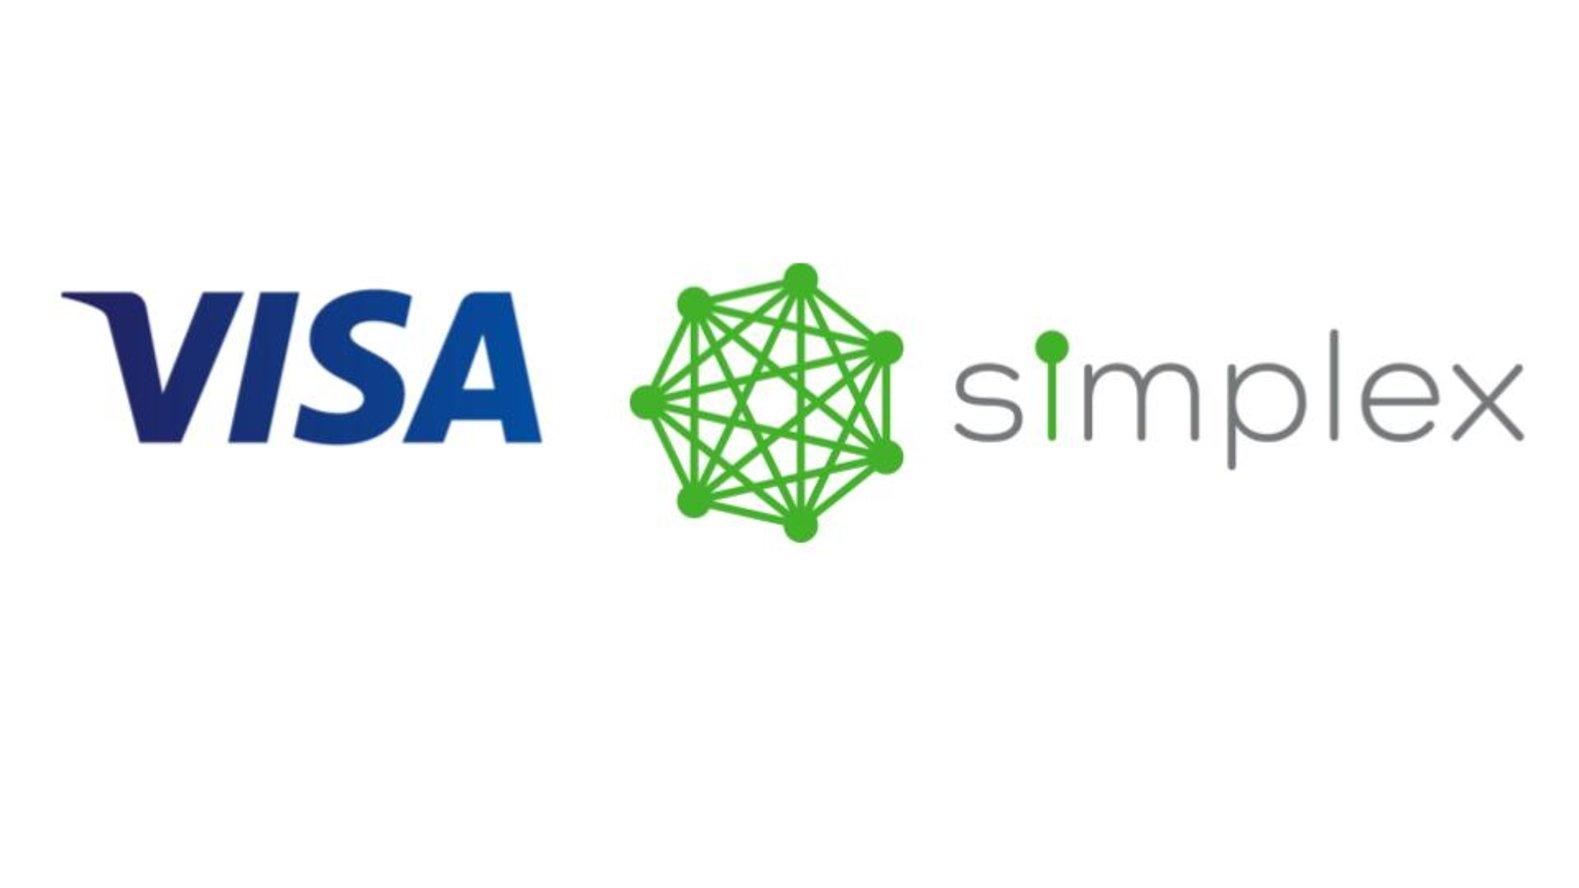 Simplex被确认为Visa主要会员和欧盟借记卡发卡行